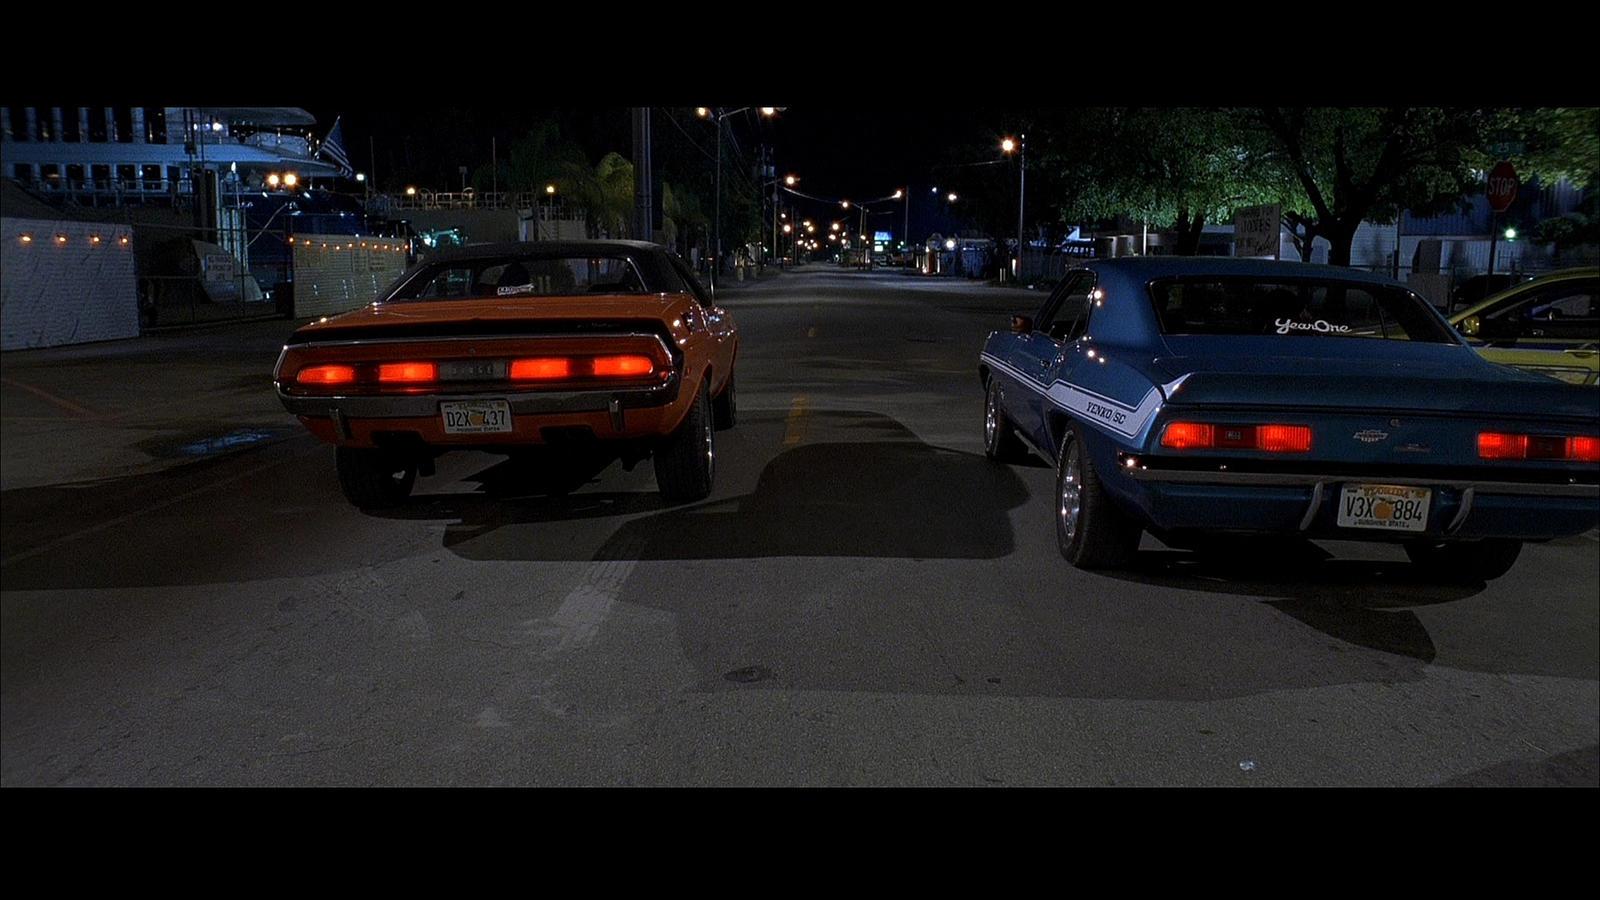 2 fast 2 furious muscle cars 2 by newyunggun on deviantart